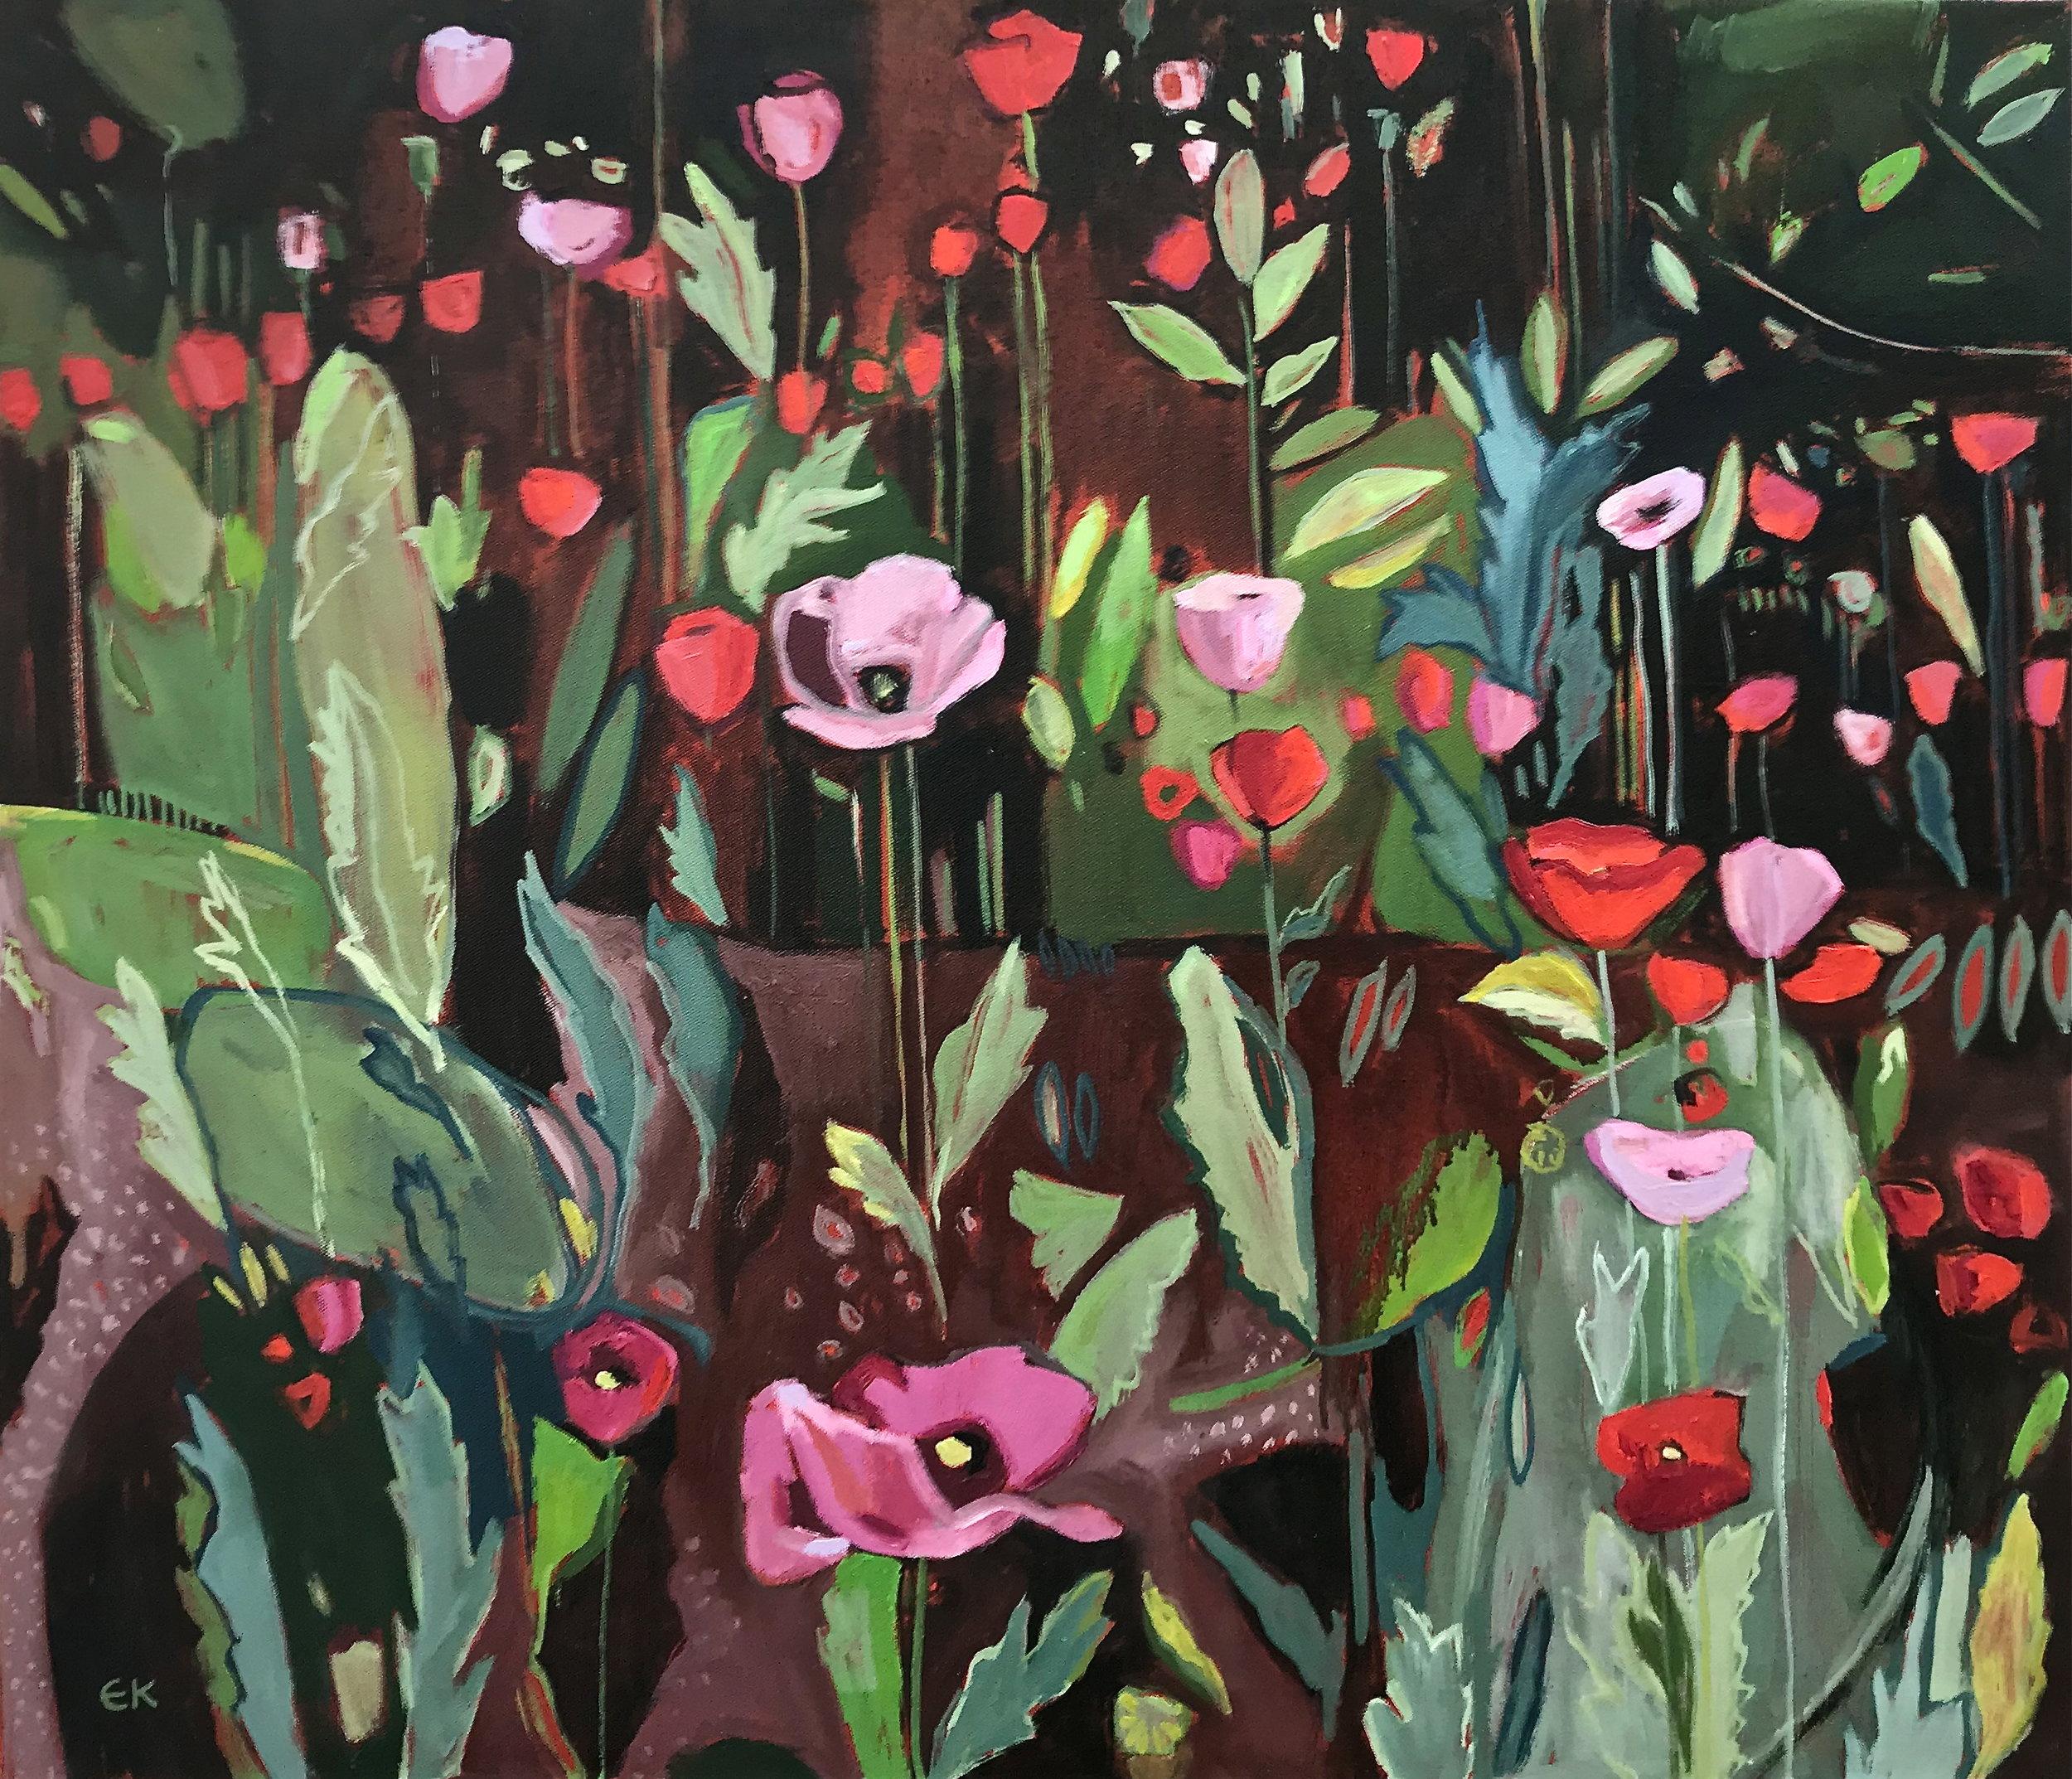 Opium Poppies Again (Oxford Botanic Garden)